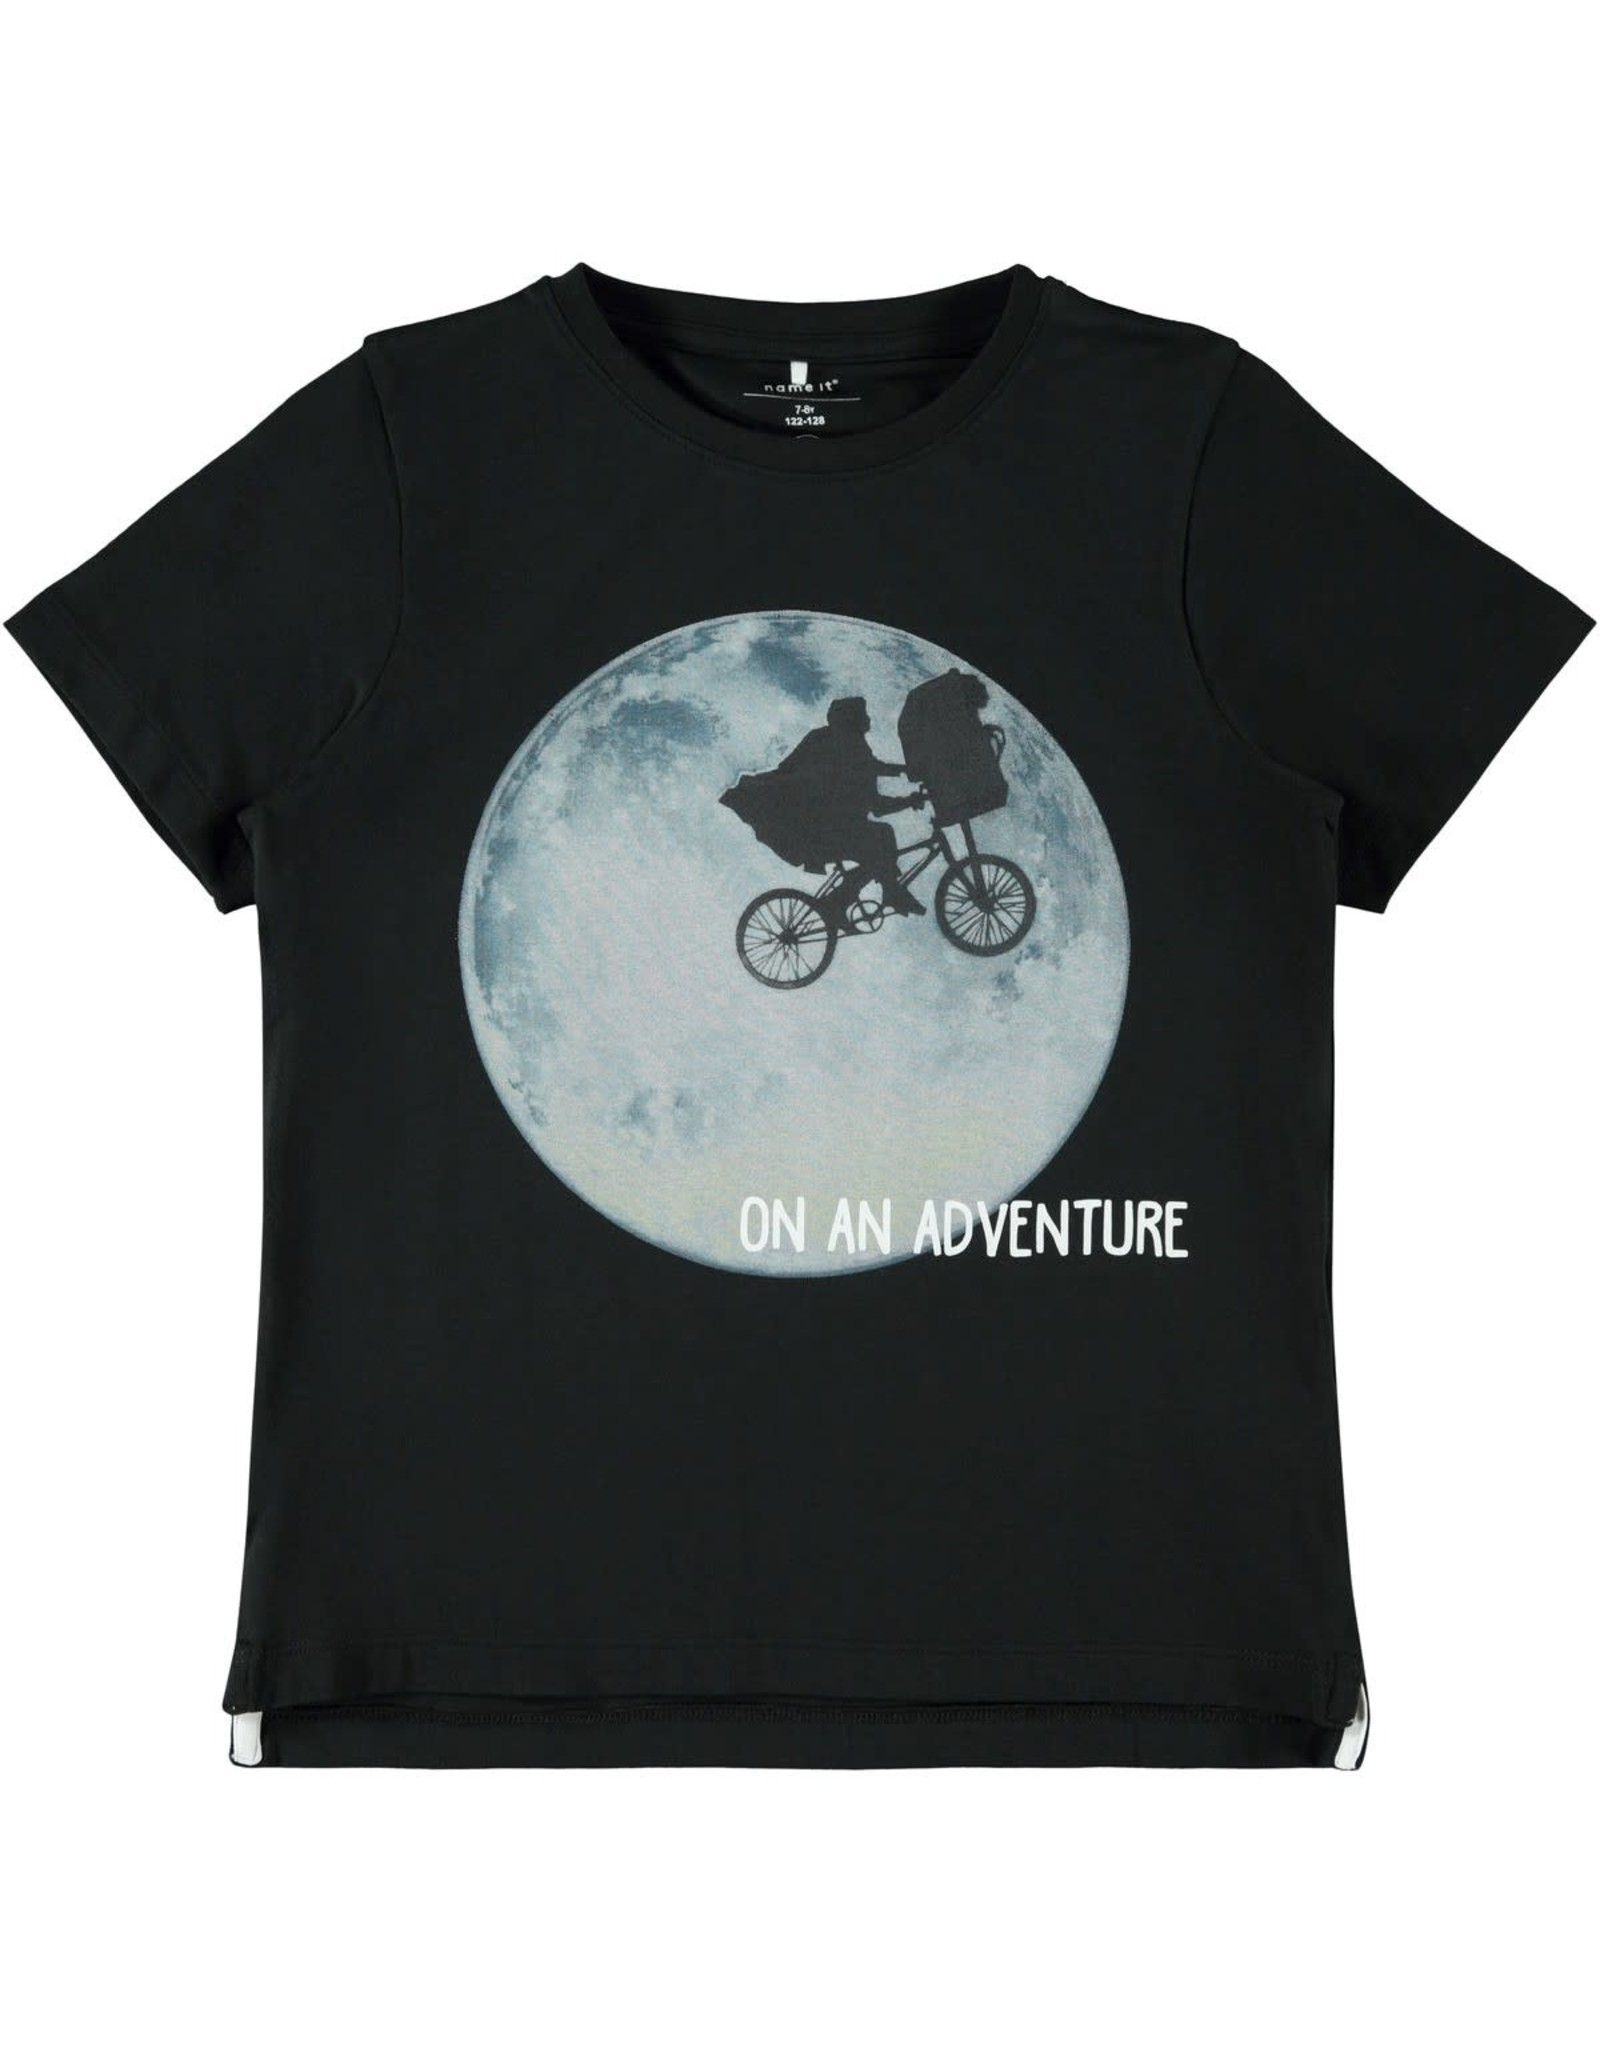 Name It Zwarte OF grijze E.T. t-shirt van Name It